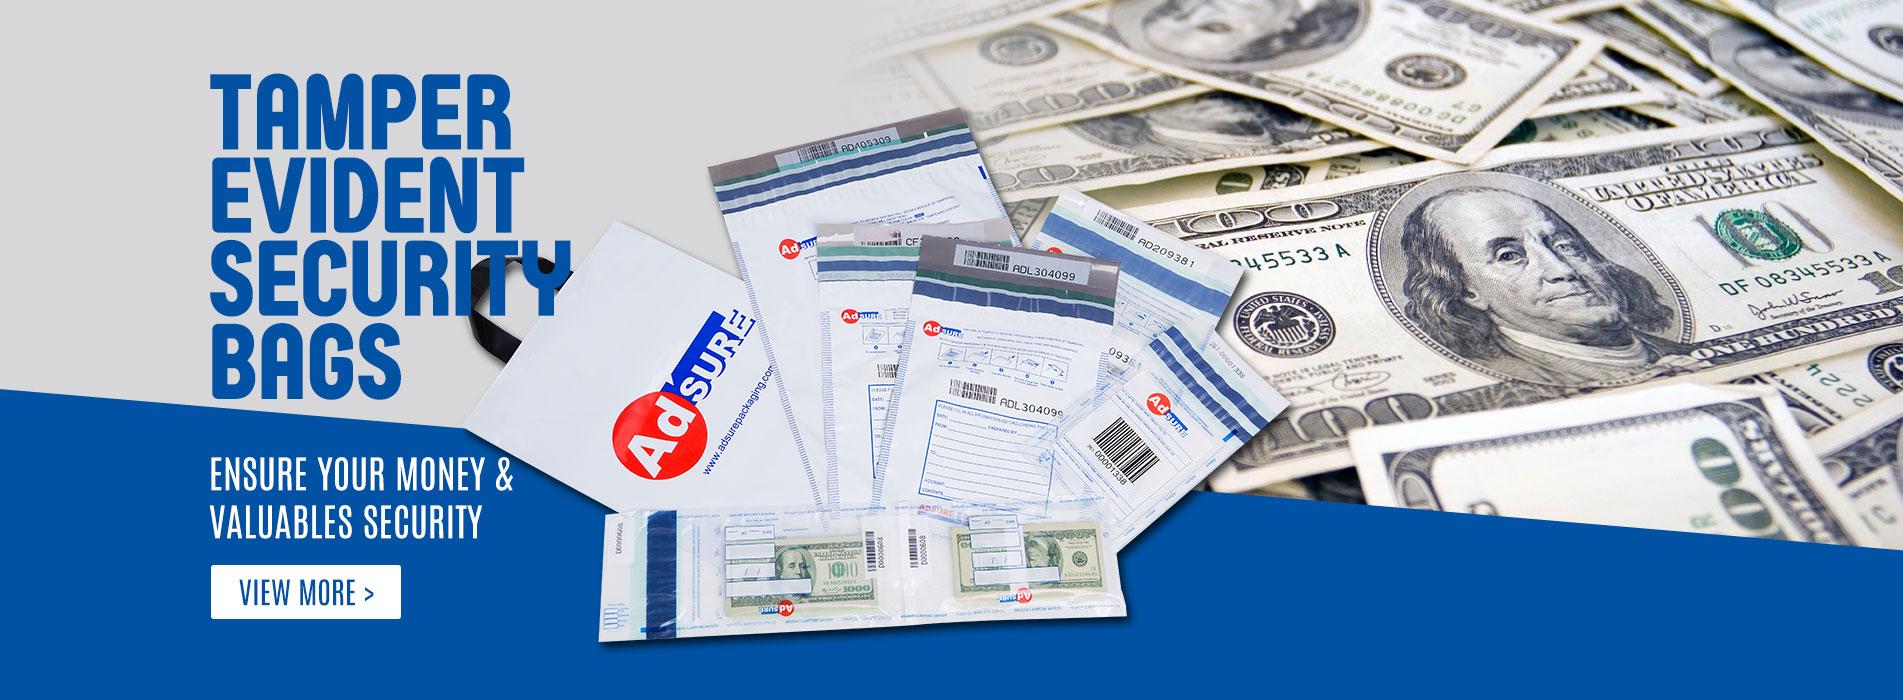 Security Bags,Bank Deposit Bags,Tamper Evident Bags